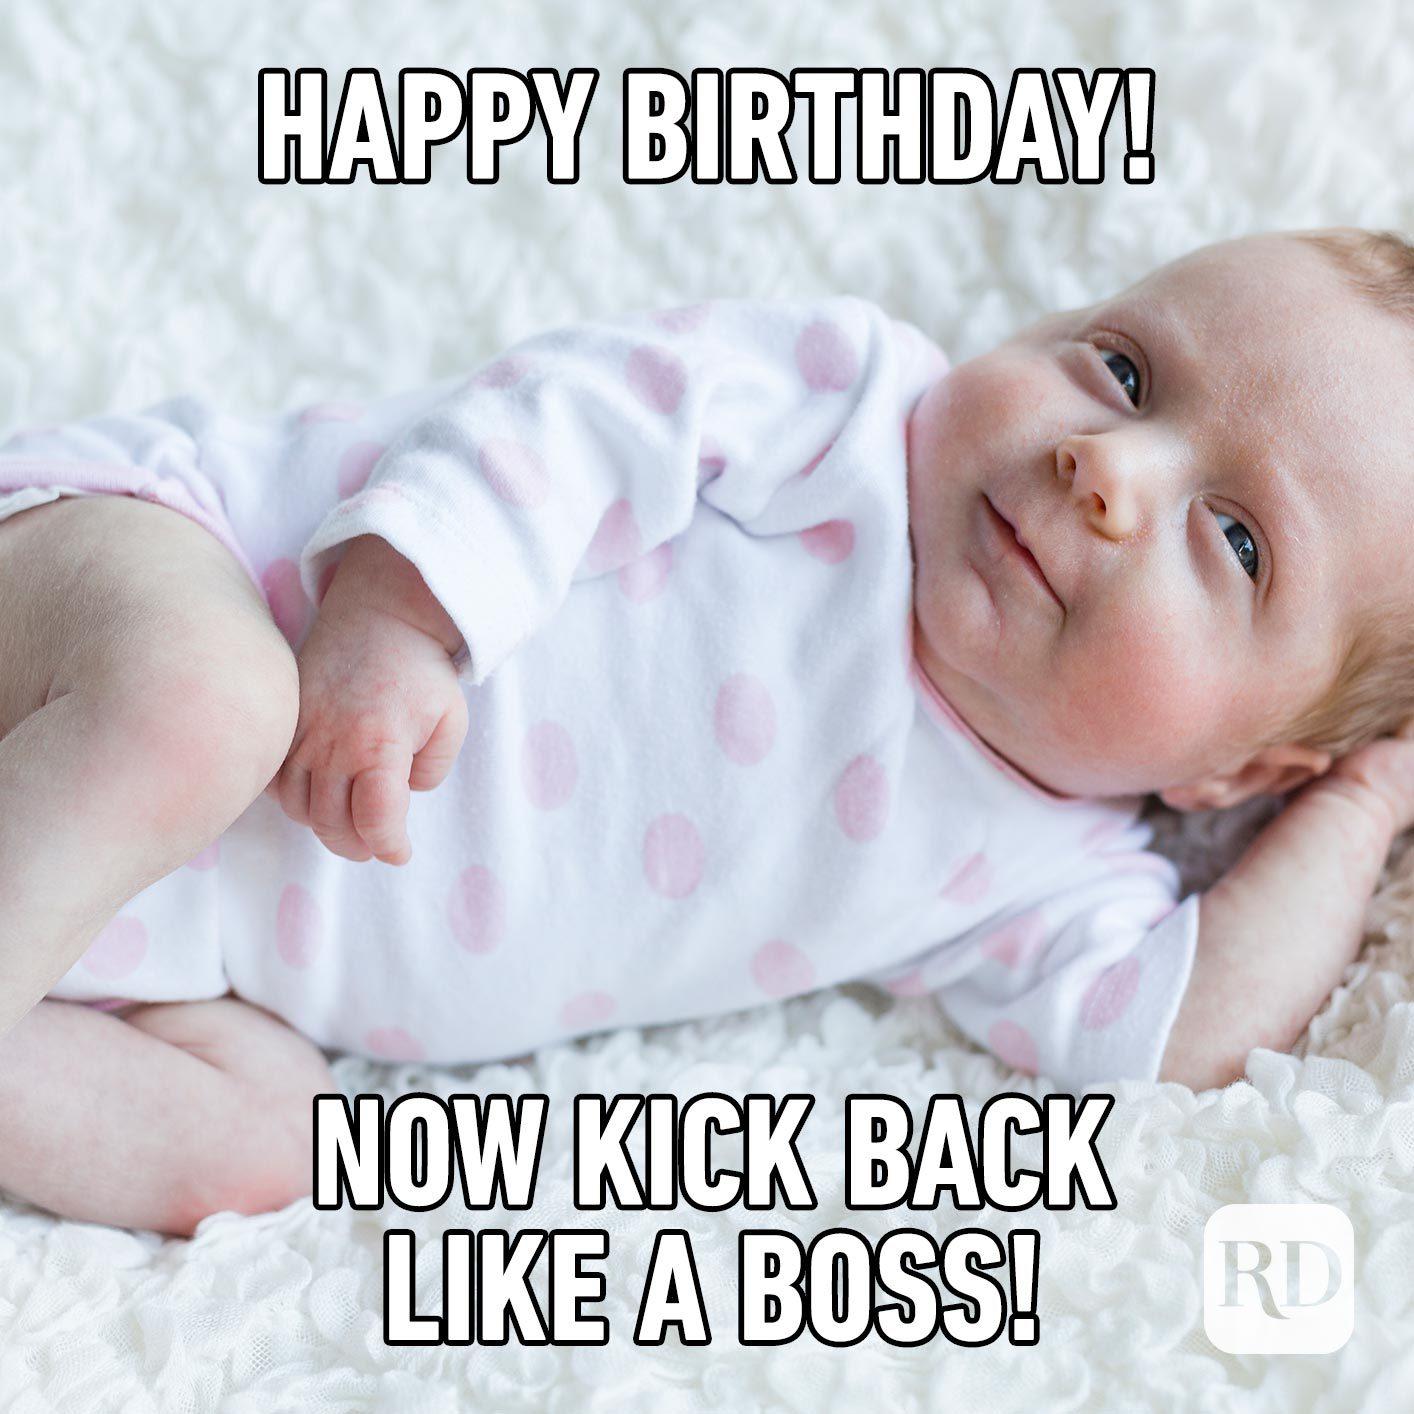 Happy birthday! Now kick back like a boss.